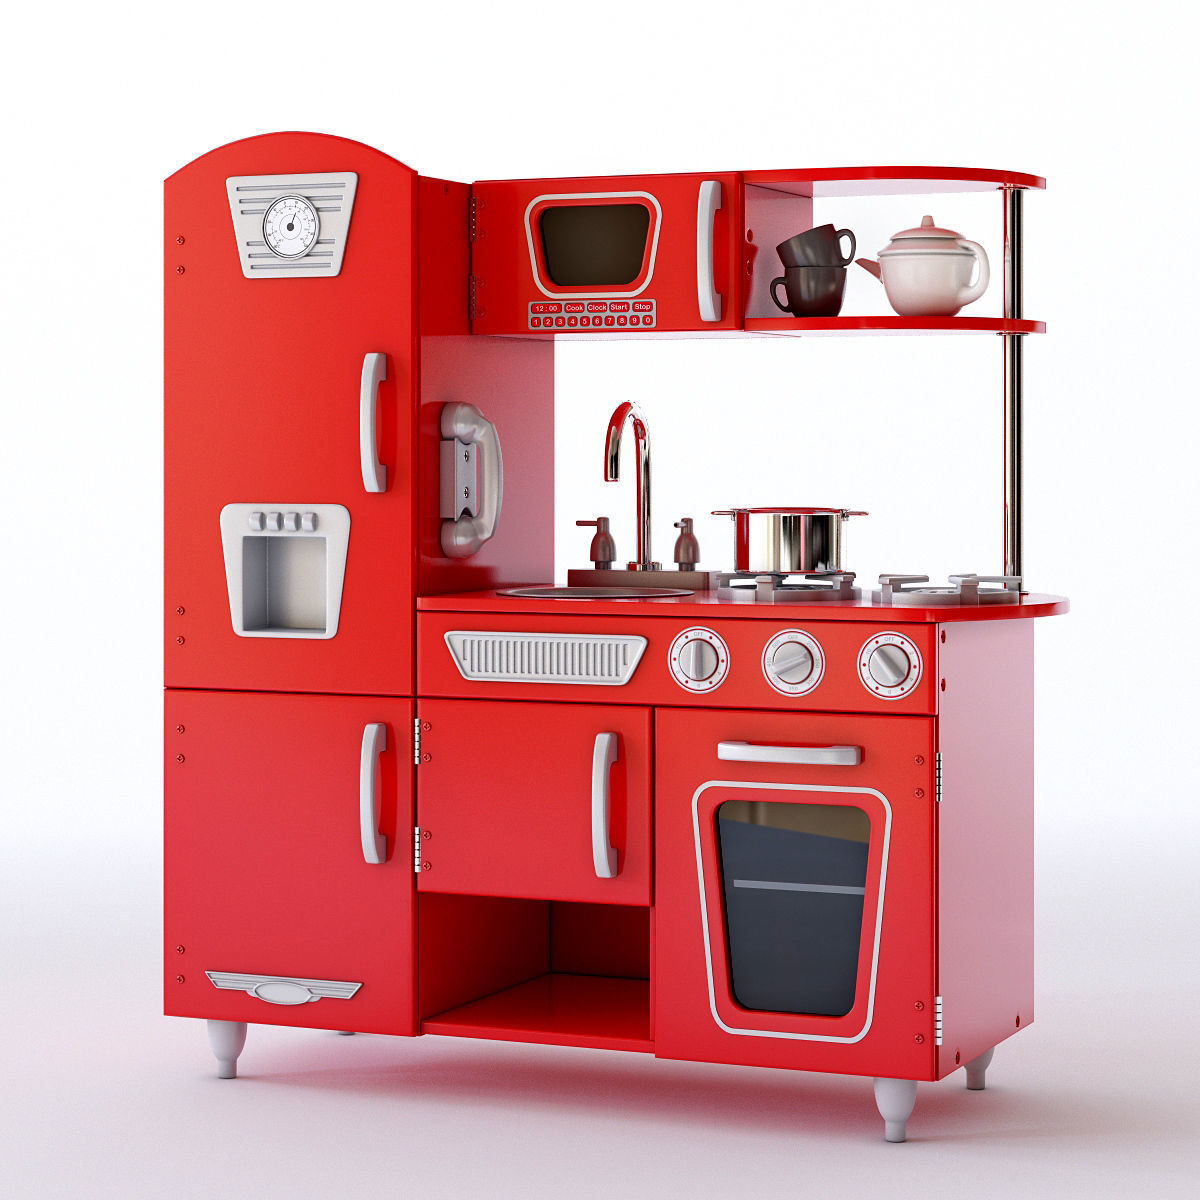 3d Model Kidkraft Vintage Play Kitchen Cgtrader